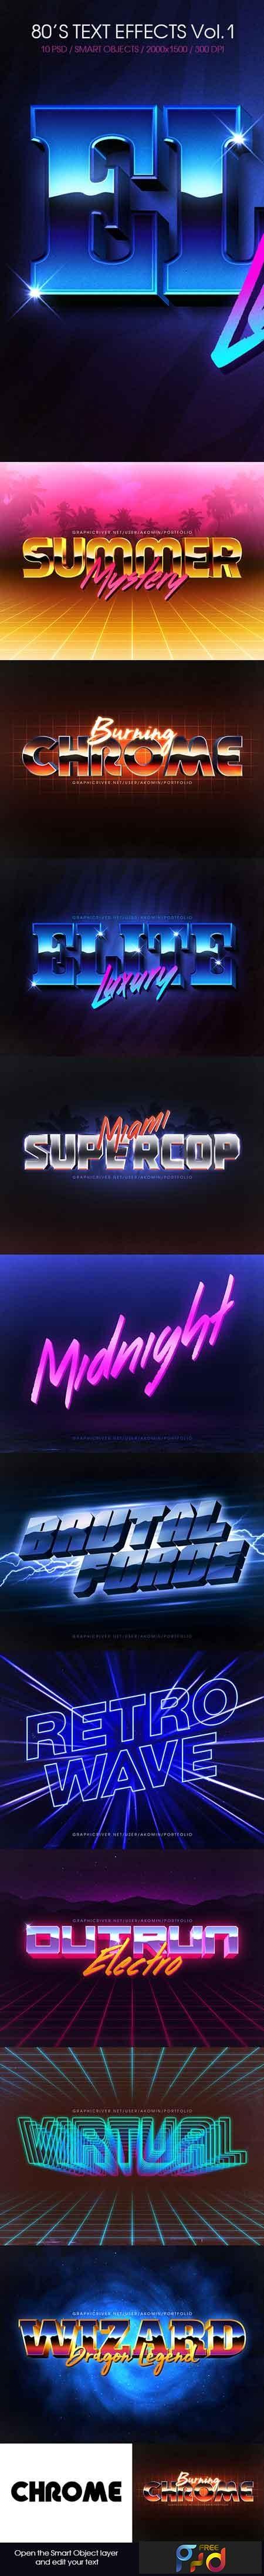 80s Text Effects Vol 1 22583100 - FreePSDvn